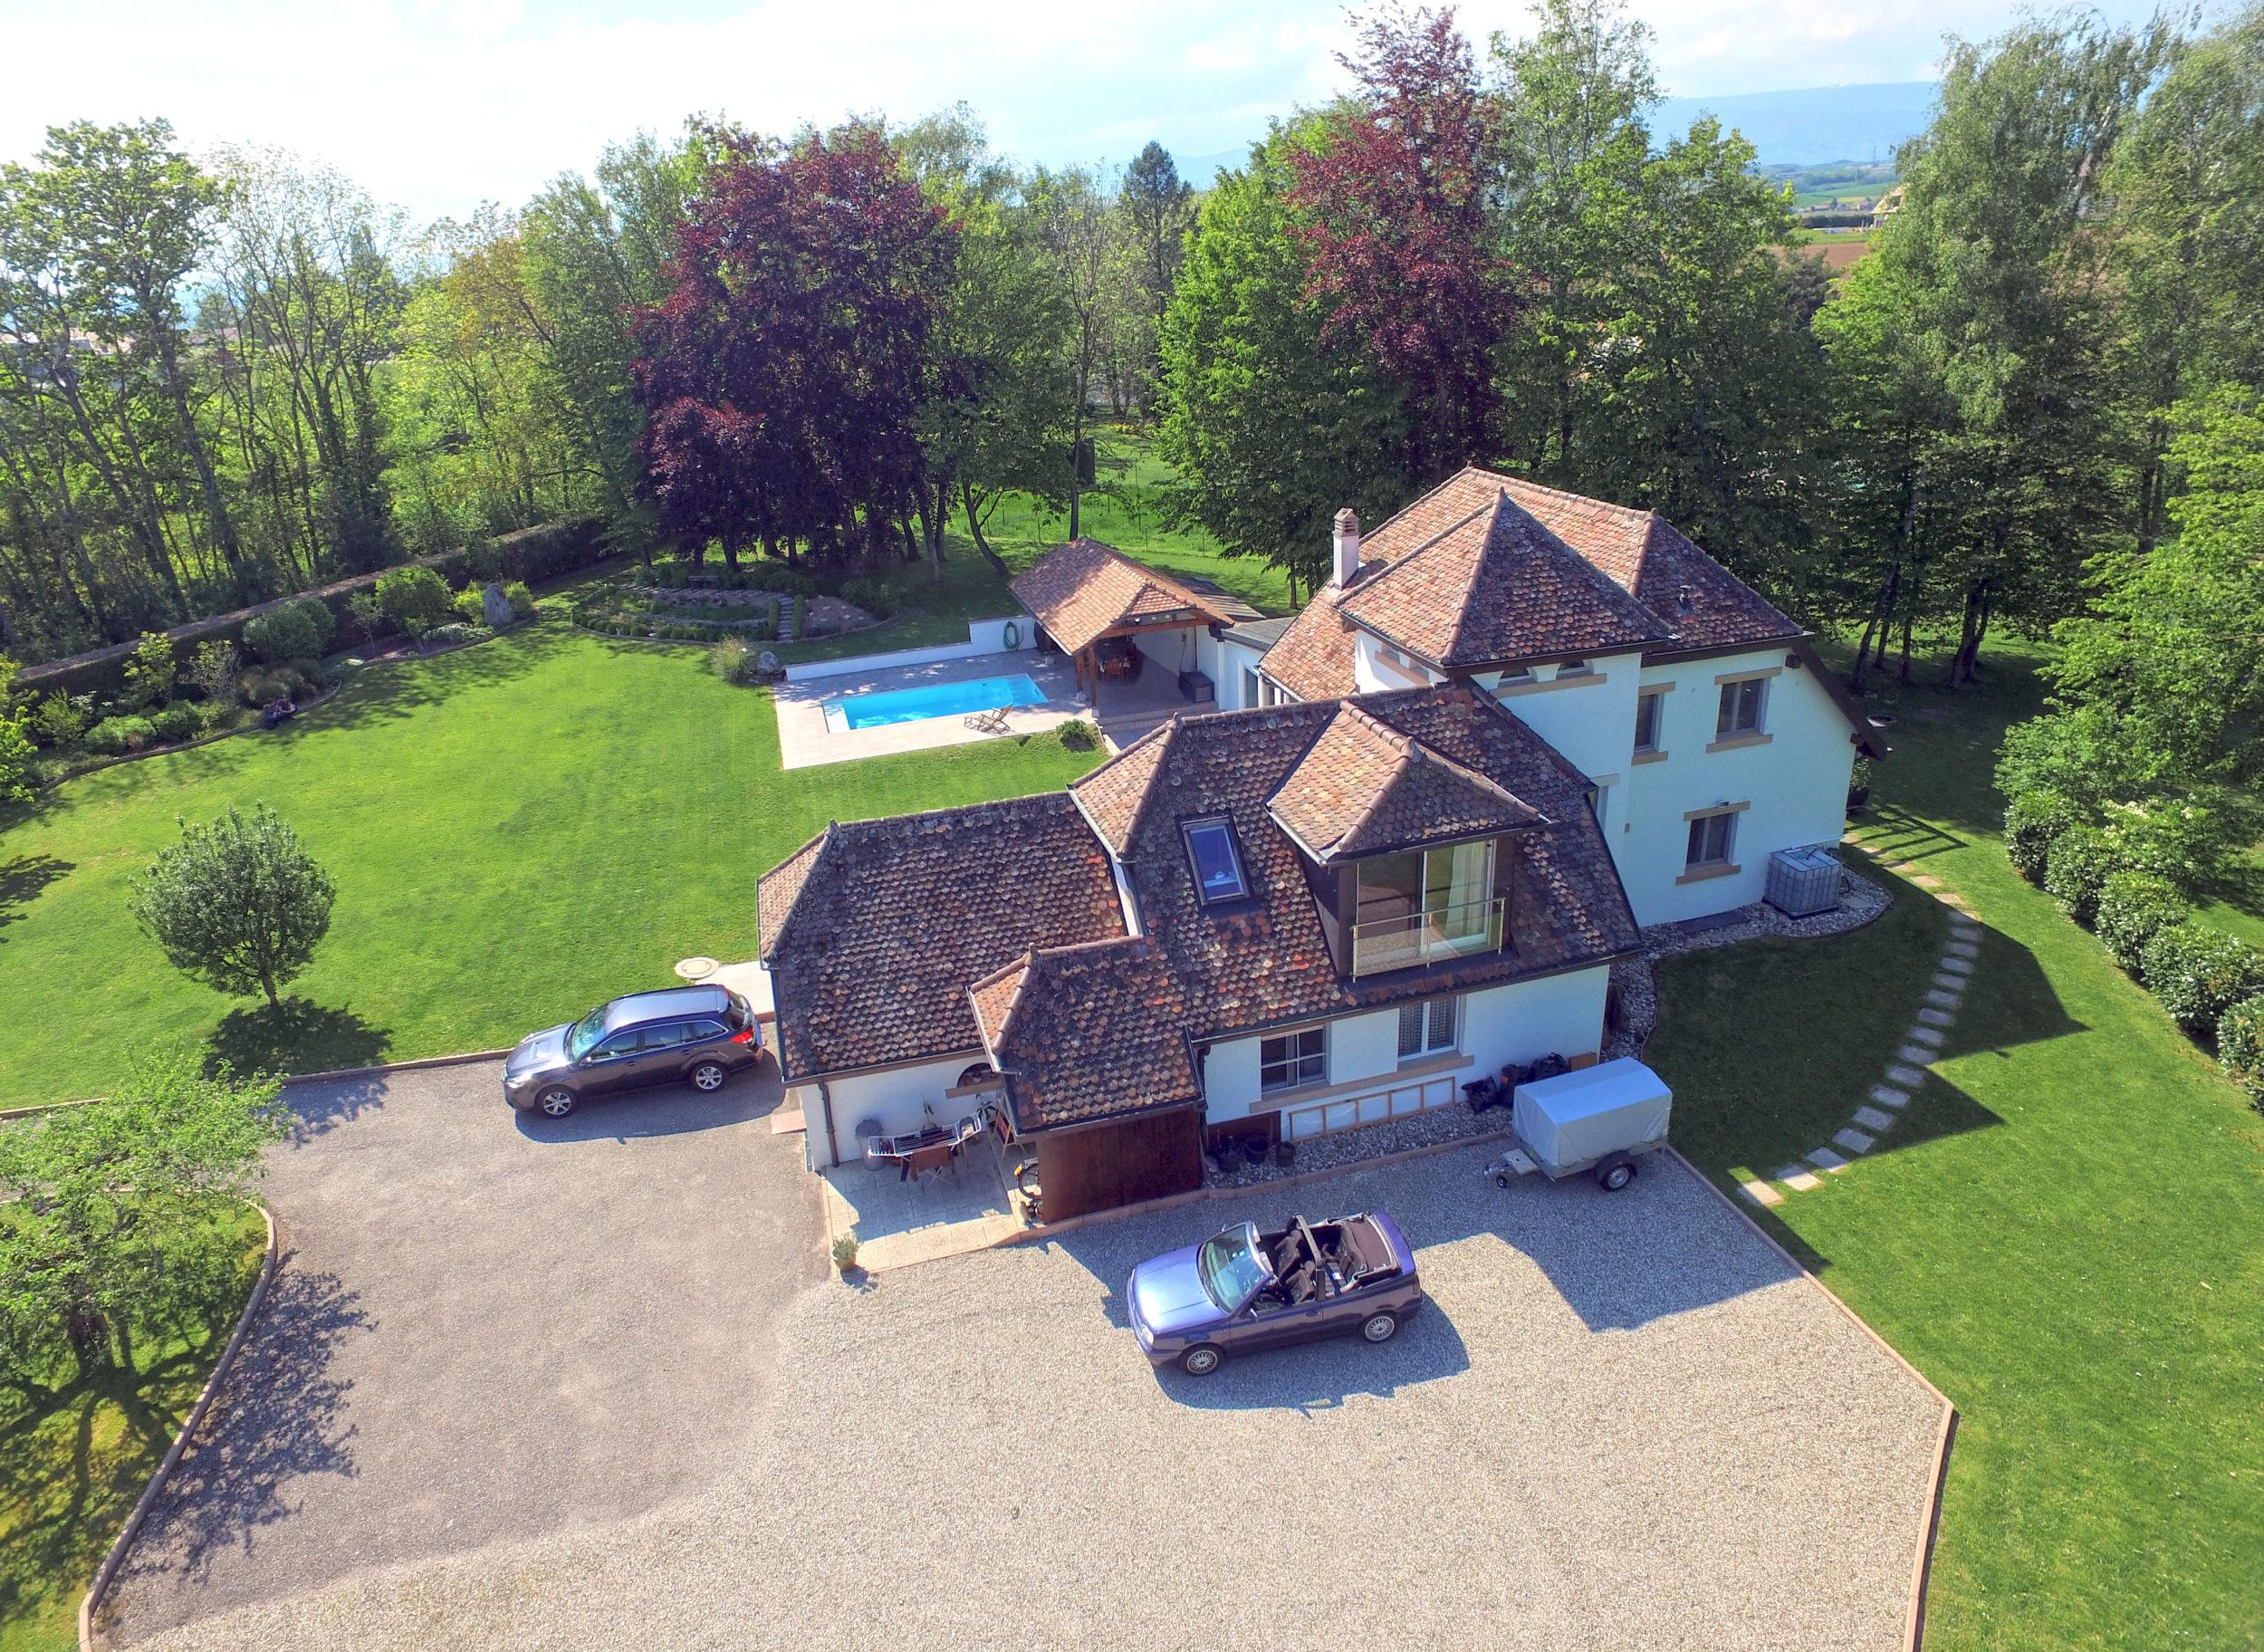 Aerial view - Drone - Villa in Denens